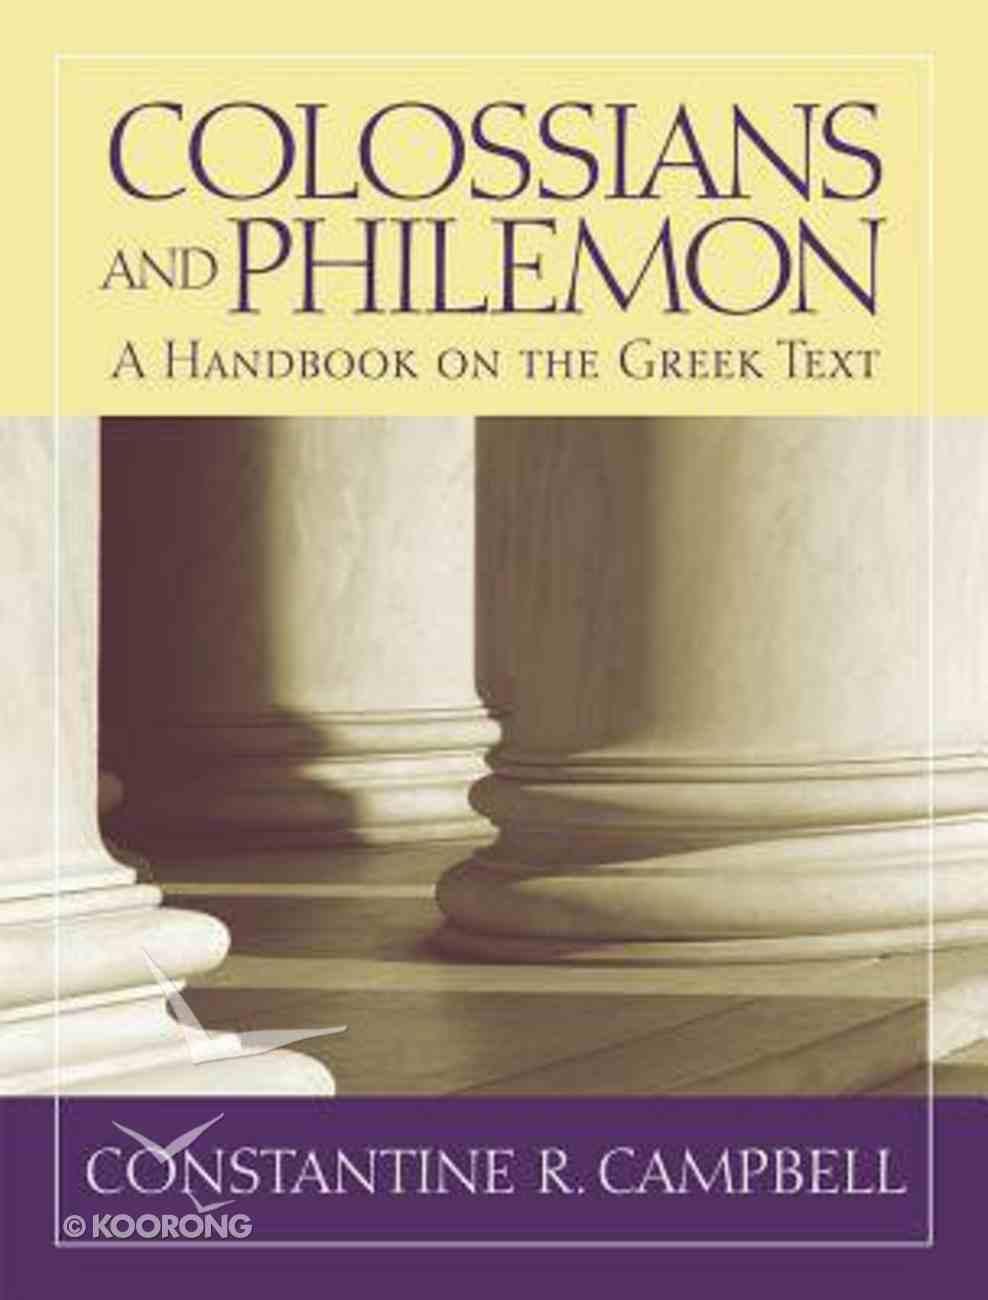 Colossians & Philemon: A Handbook on the Greek Text (Baylor Handbook On The Greek New Testament Series) Paperback